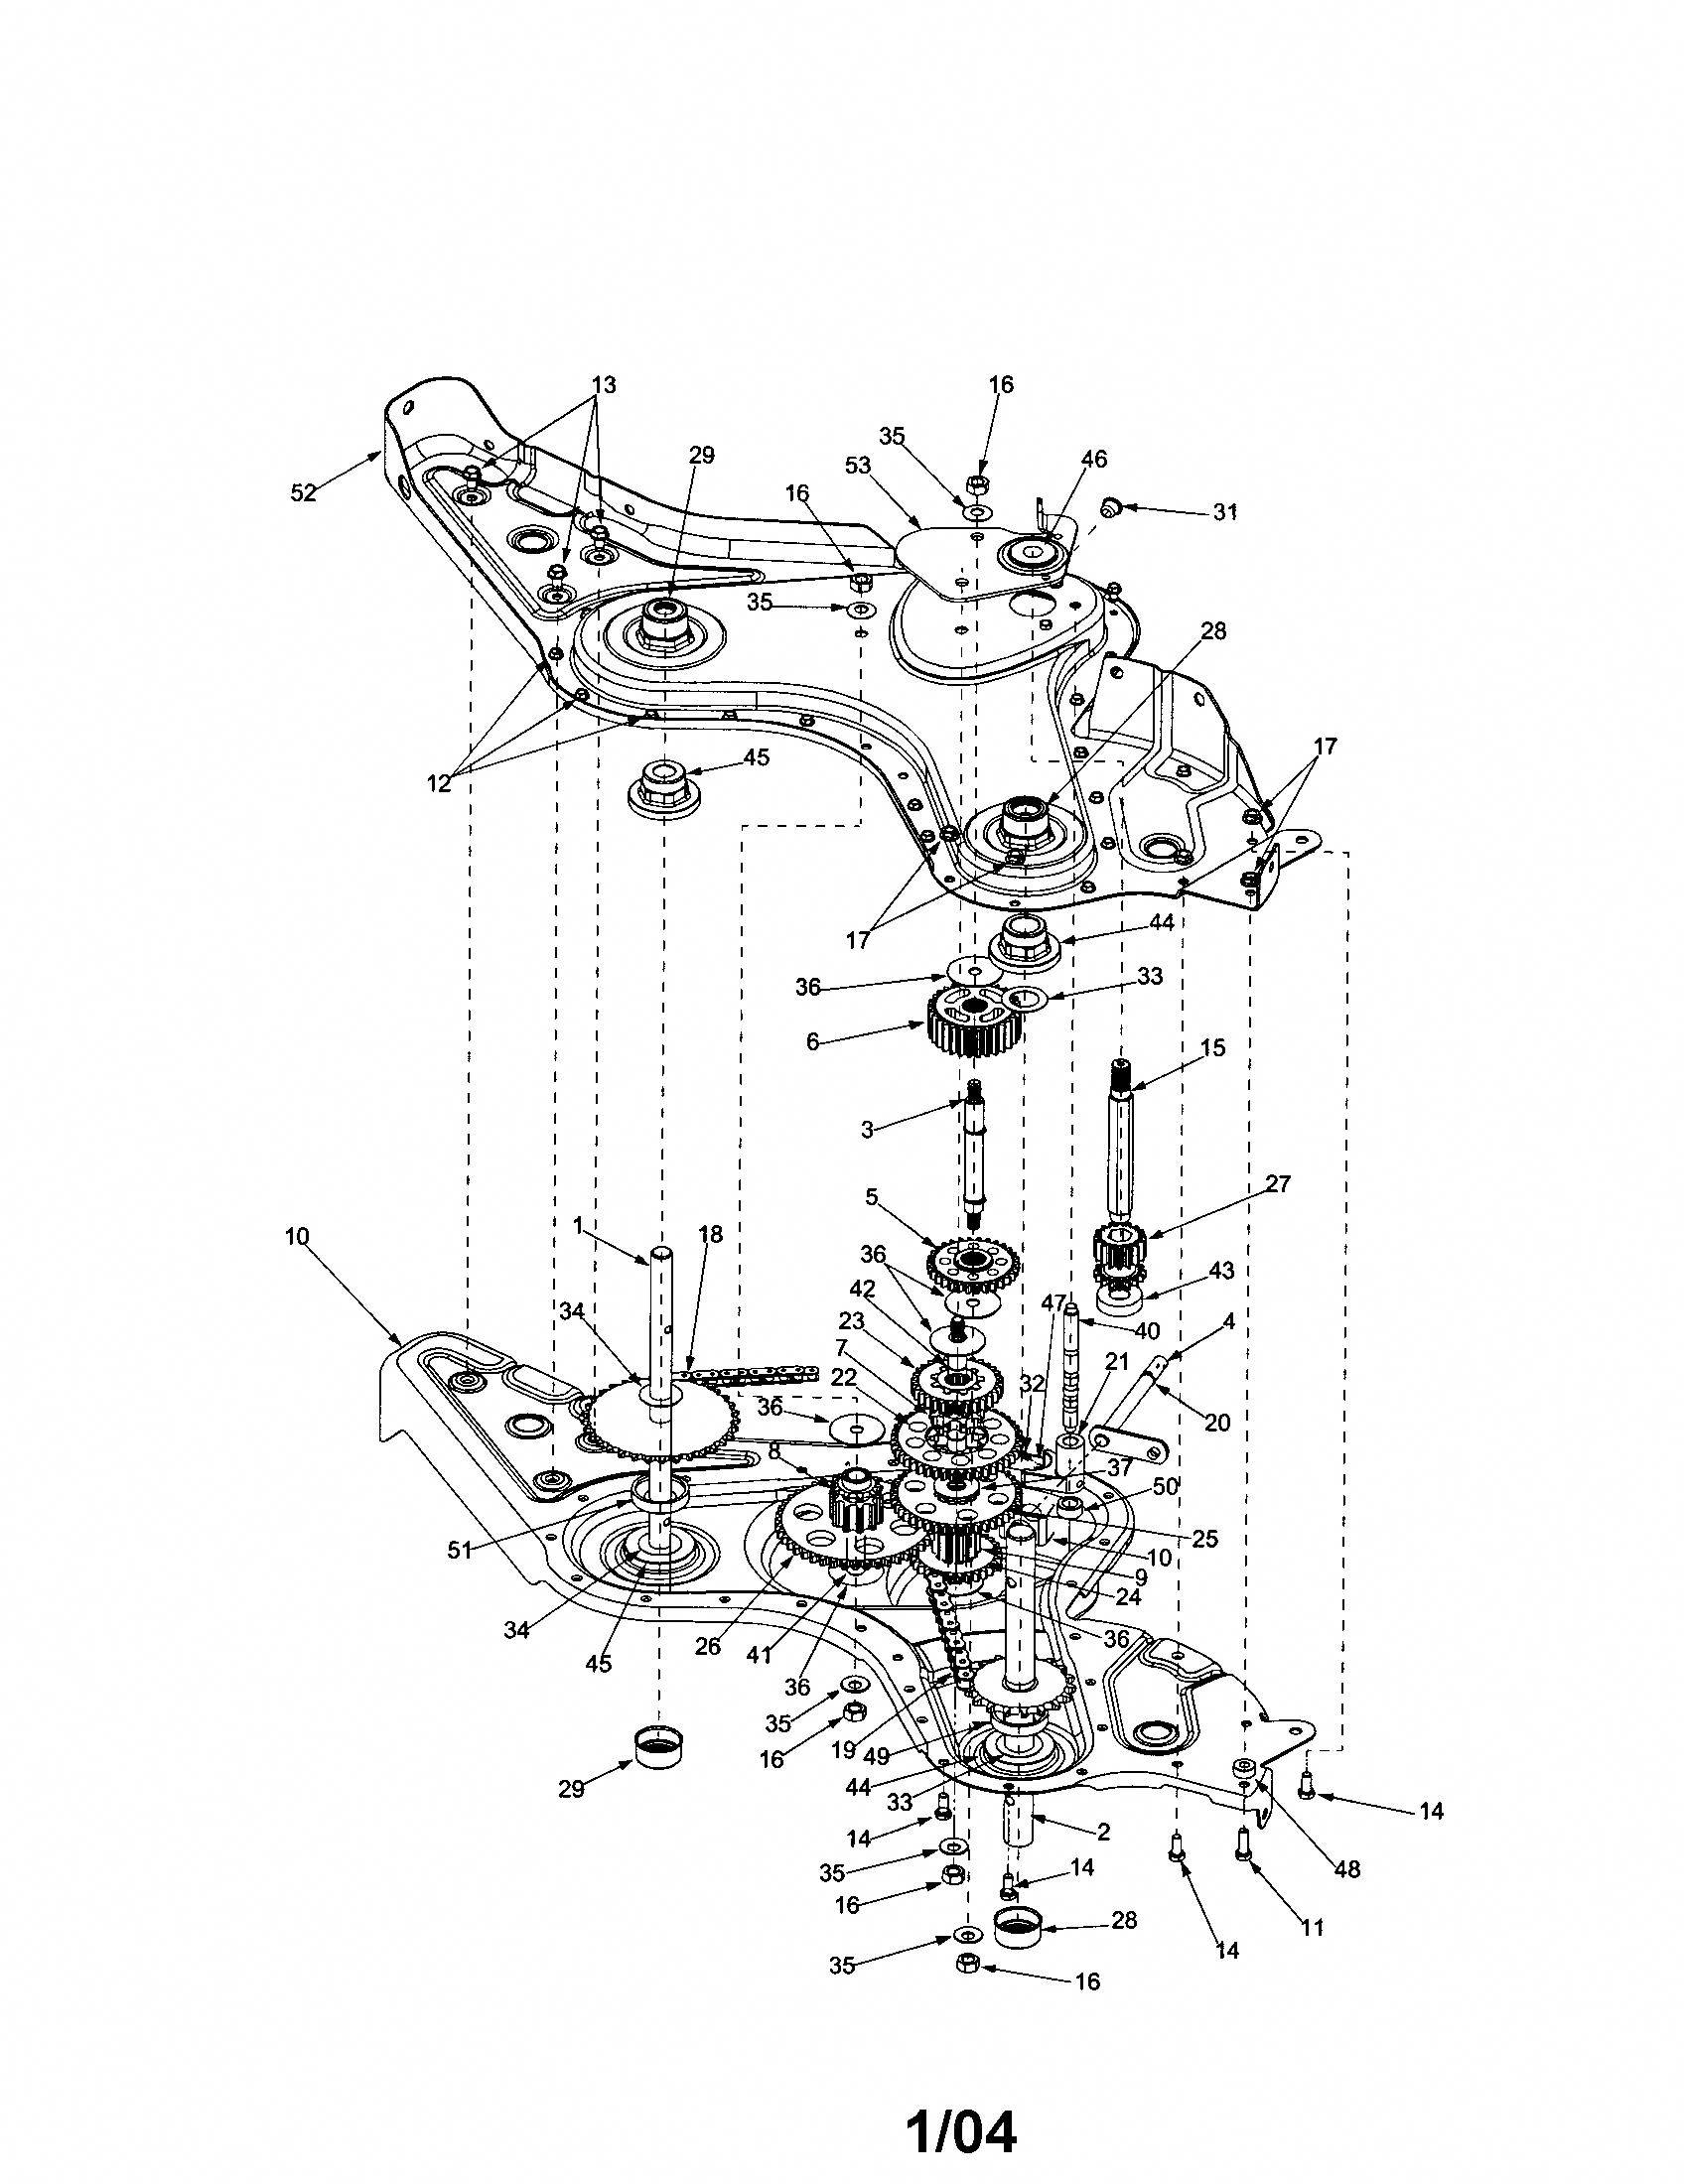 MTD Rear Tine Tiller Diagram | Mtd Rear tine tiller Wheel shaft/tine  Mtd Yard Machine Wiring Diagram on tecumseh wiring diagram, yard machine deck diagram, yard machine spring diagram, mtd yardman wiring diagram, mtd yard machines 13an771g729, yard machines tiller parts diagram, weekend warrior generator wiring diagram, pto wiring diagram, mtd wiring diagram model 13as679g062, karcher wiring diagram, ignition switch wiring diagram, mtd tiller diagram, mtd transmission diagram, mtd yard machines riding lawn mower, mtd yardman belt diagram, mtd yard machines belt replacement, fisher minute mount plow solenoid wiring diagram, mtd yard bug belt diagram, mtd yard machines carburetor diagram, yard machine push mower diagram,